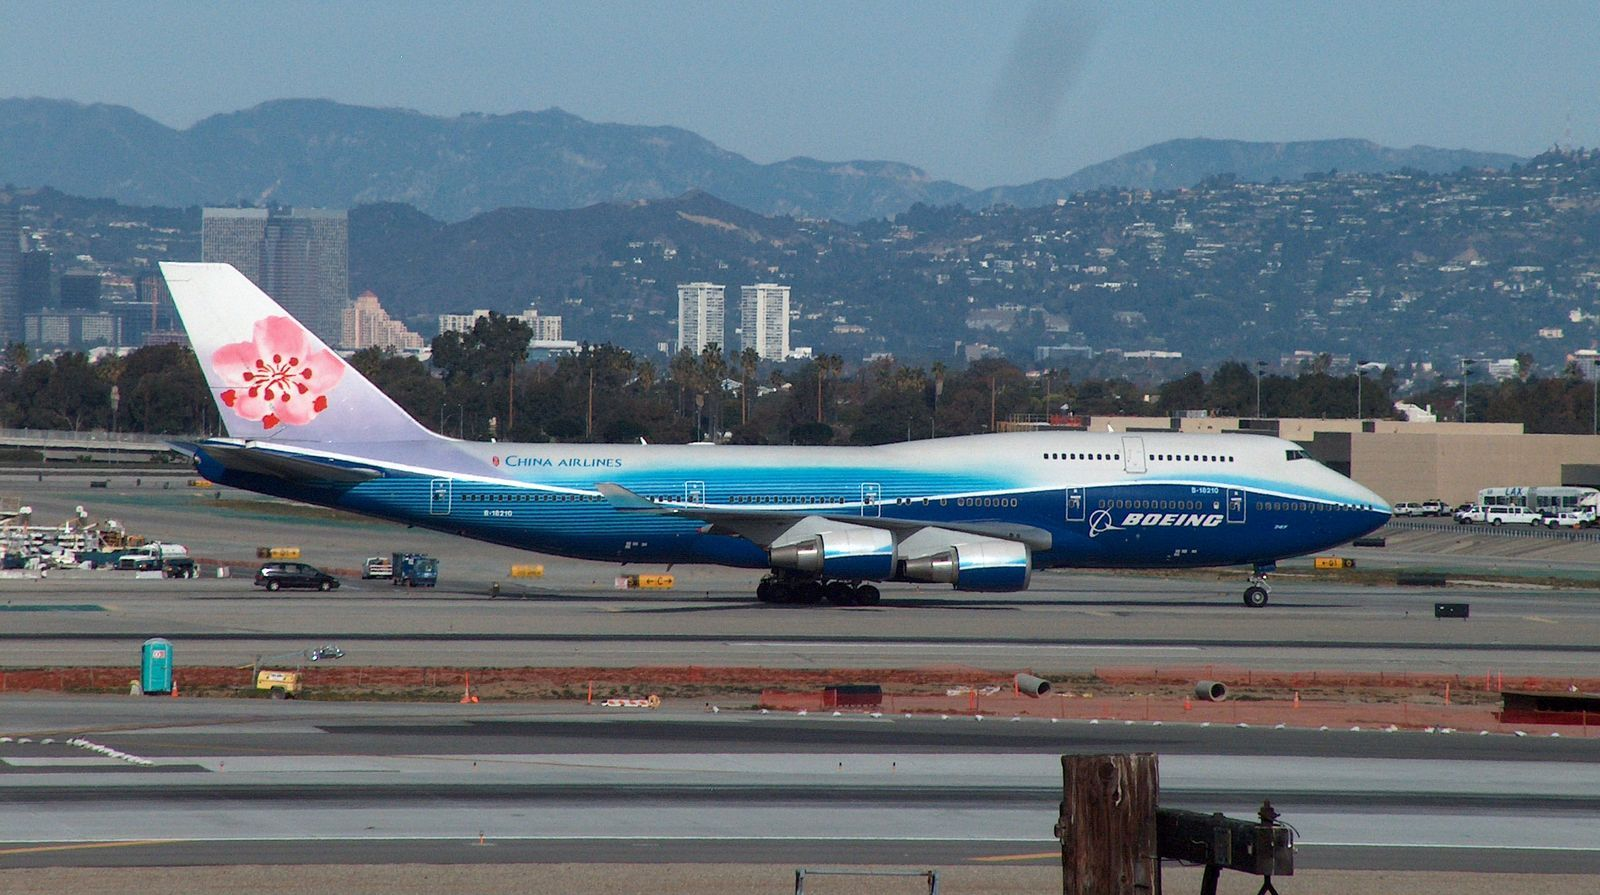 http://4.bp.blogspot.com/_ja676MG45Zg/TQCYmns0zHI/AAAAAAAAEvM/ABbXLmokYp0/s1600/china-airlines-b747-8-taxying.JPG